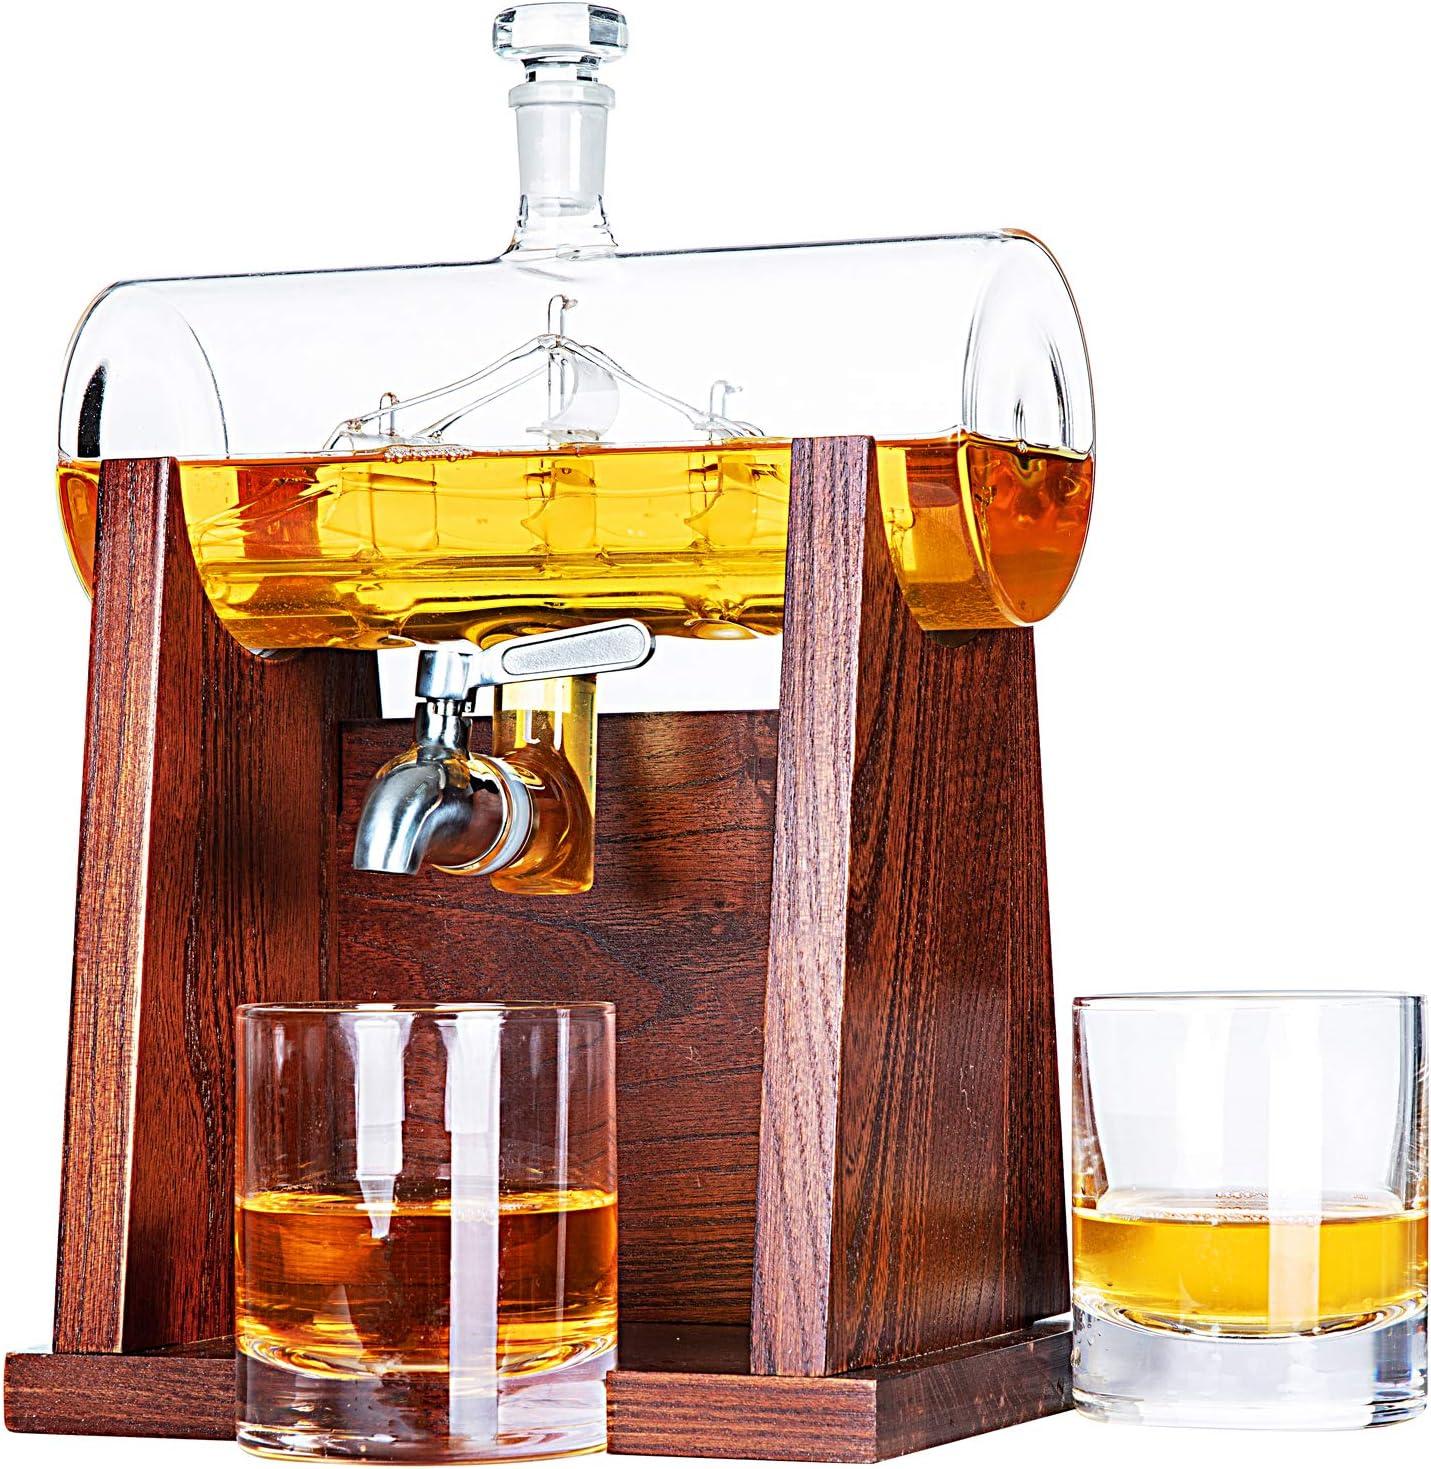 Jillmo Whiskey Decanter Set with 2 Glasses - 1250ml & 42 oz Lead Free Barrel Ship Dispenser with Detachable Wooden Holder Gift for Liquor, Scotch, Bourbon, Vodka, Whisky, Rum & Alcohol